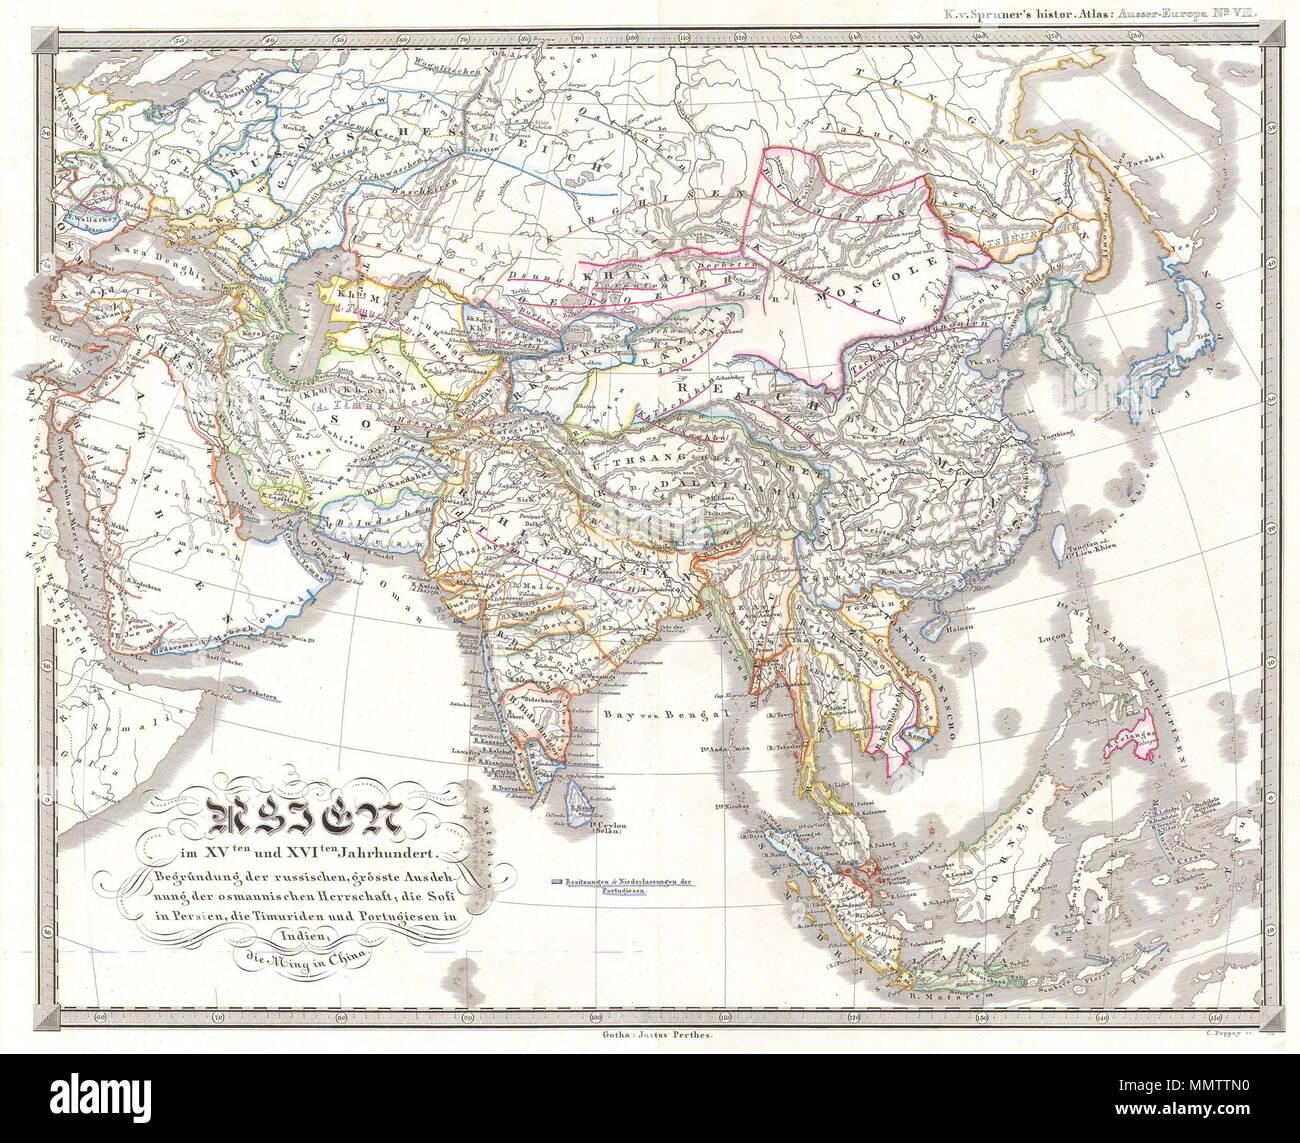 Carte Chine Ming.Anglais Cette Fascinante Colorie A La Main Carte Represente L Asie